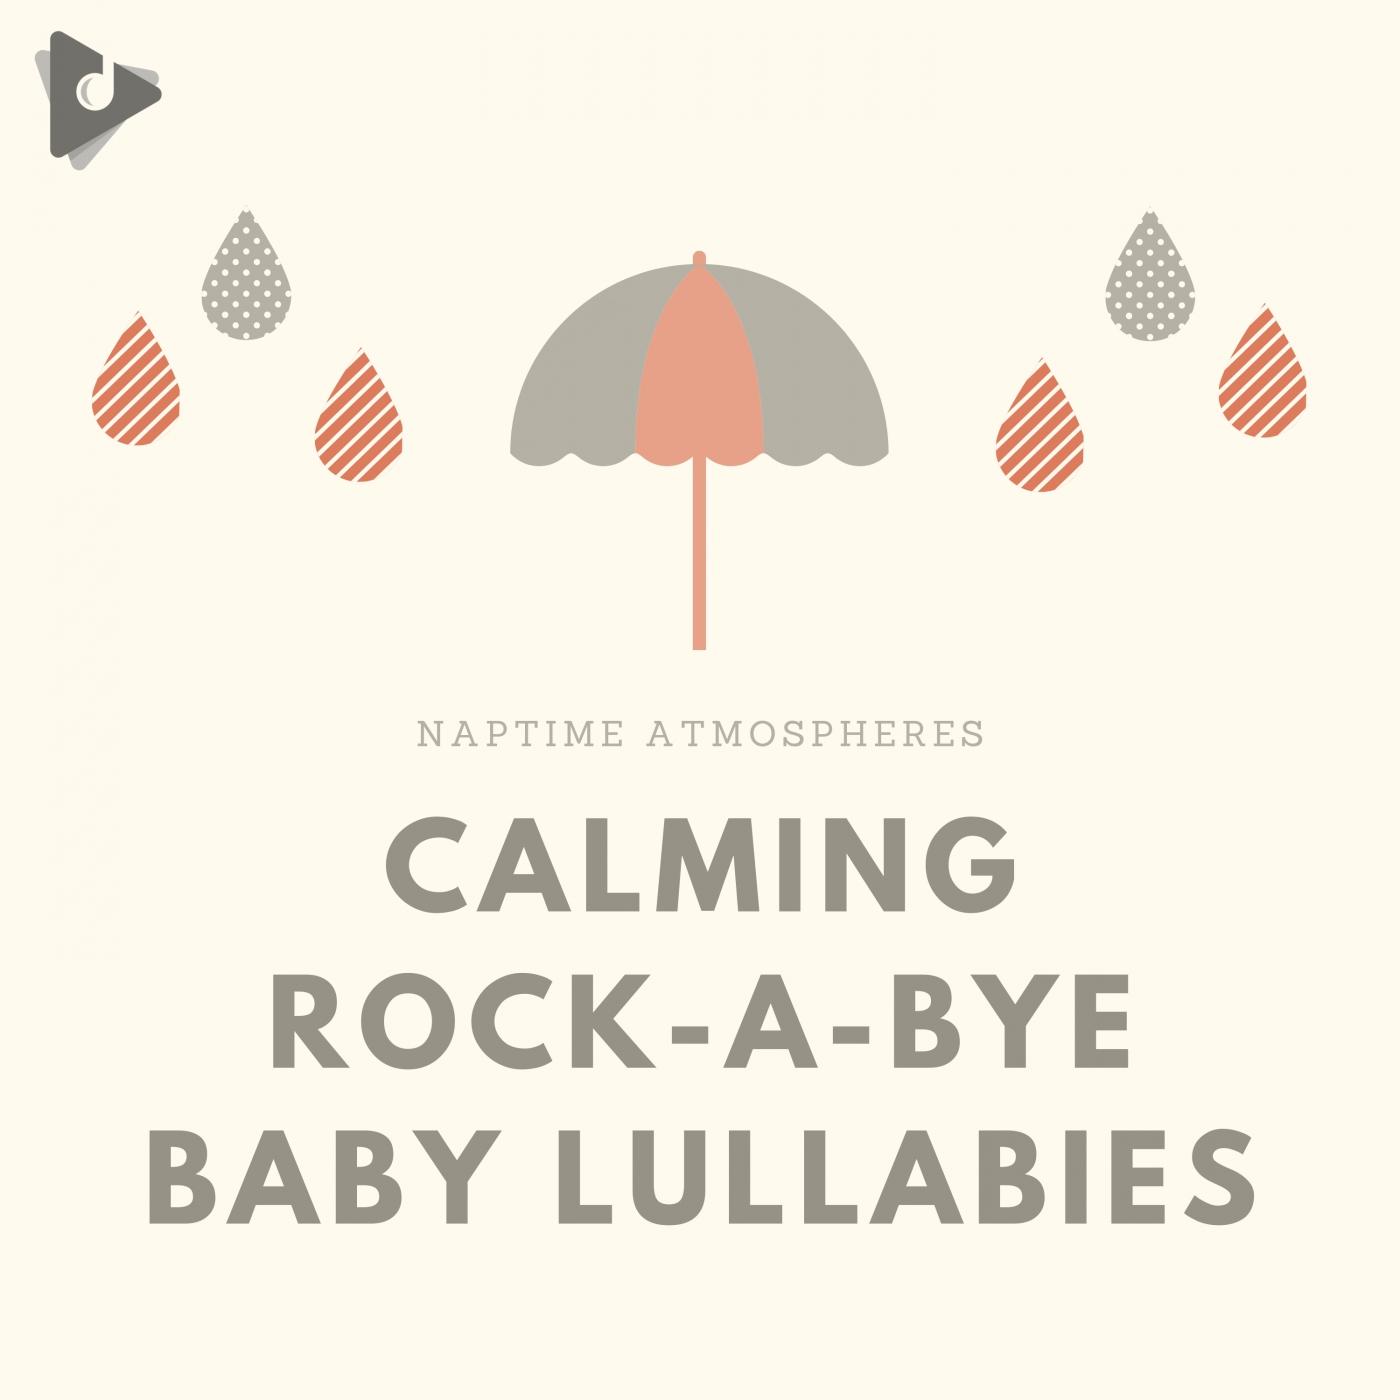 Calming Rock-A-Bye Baby Lullabies